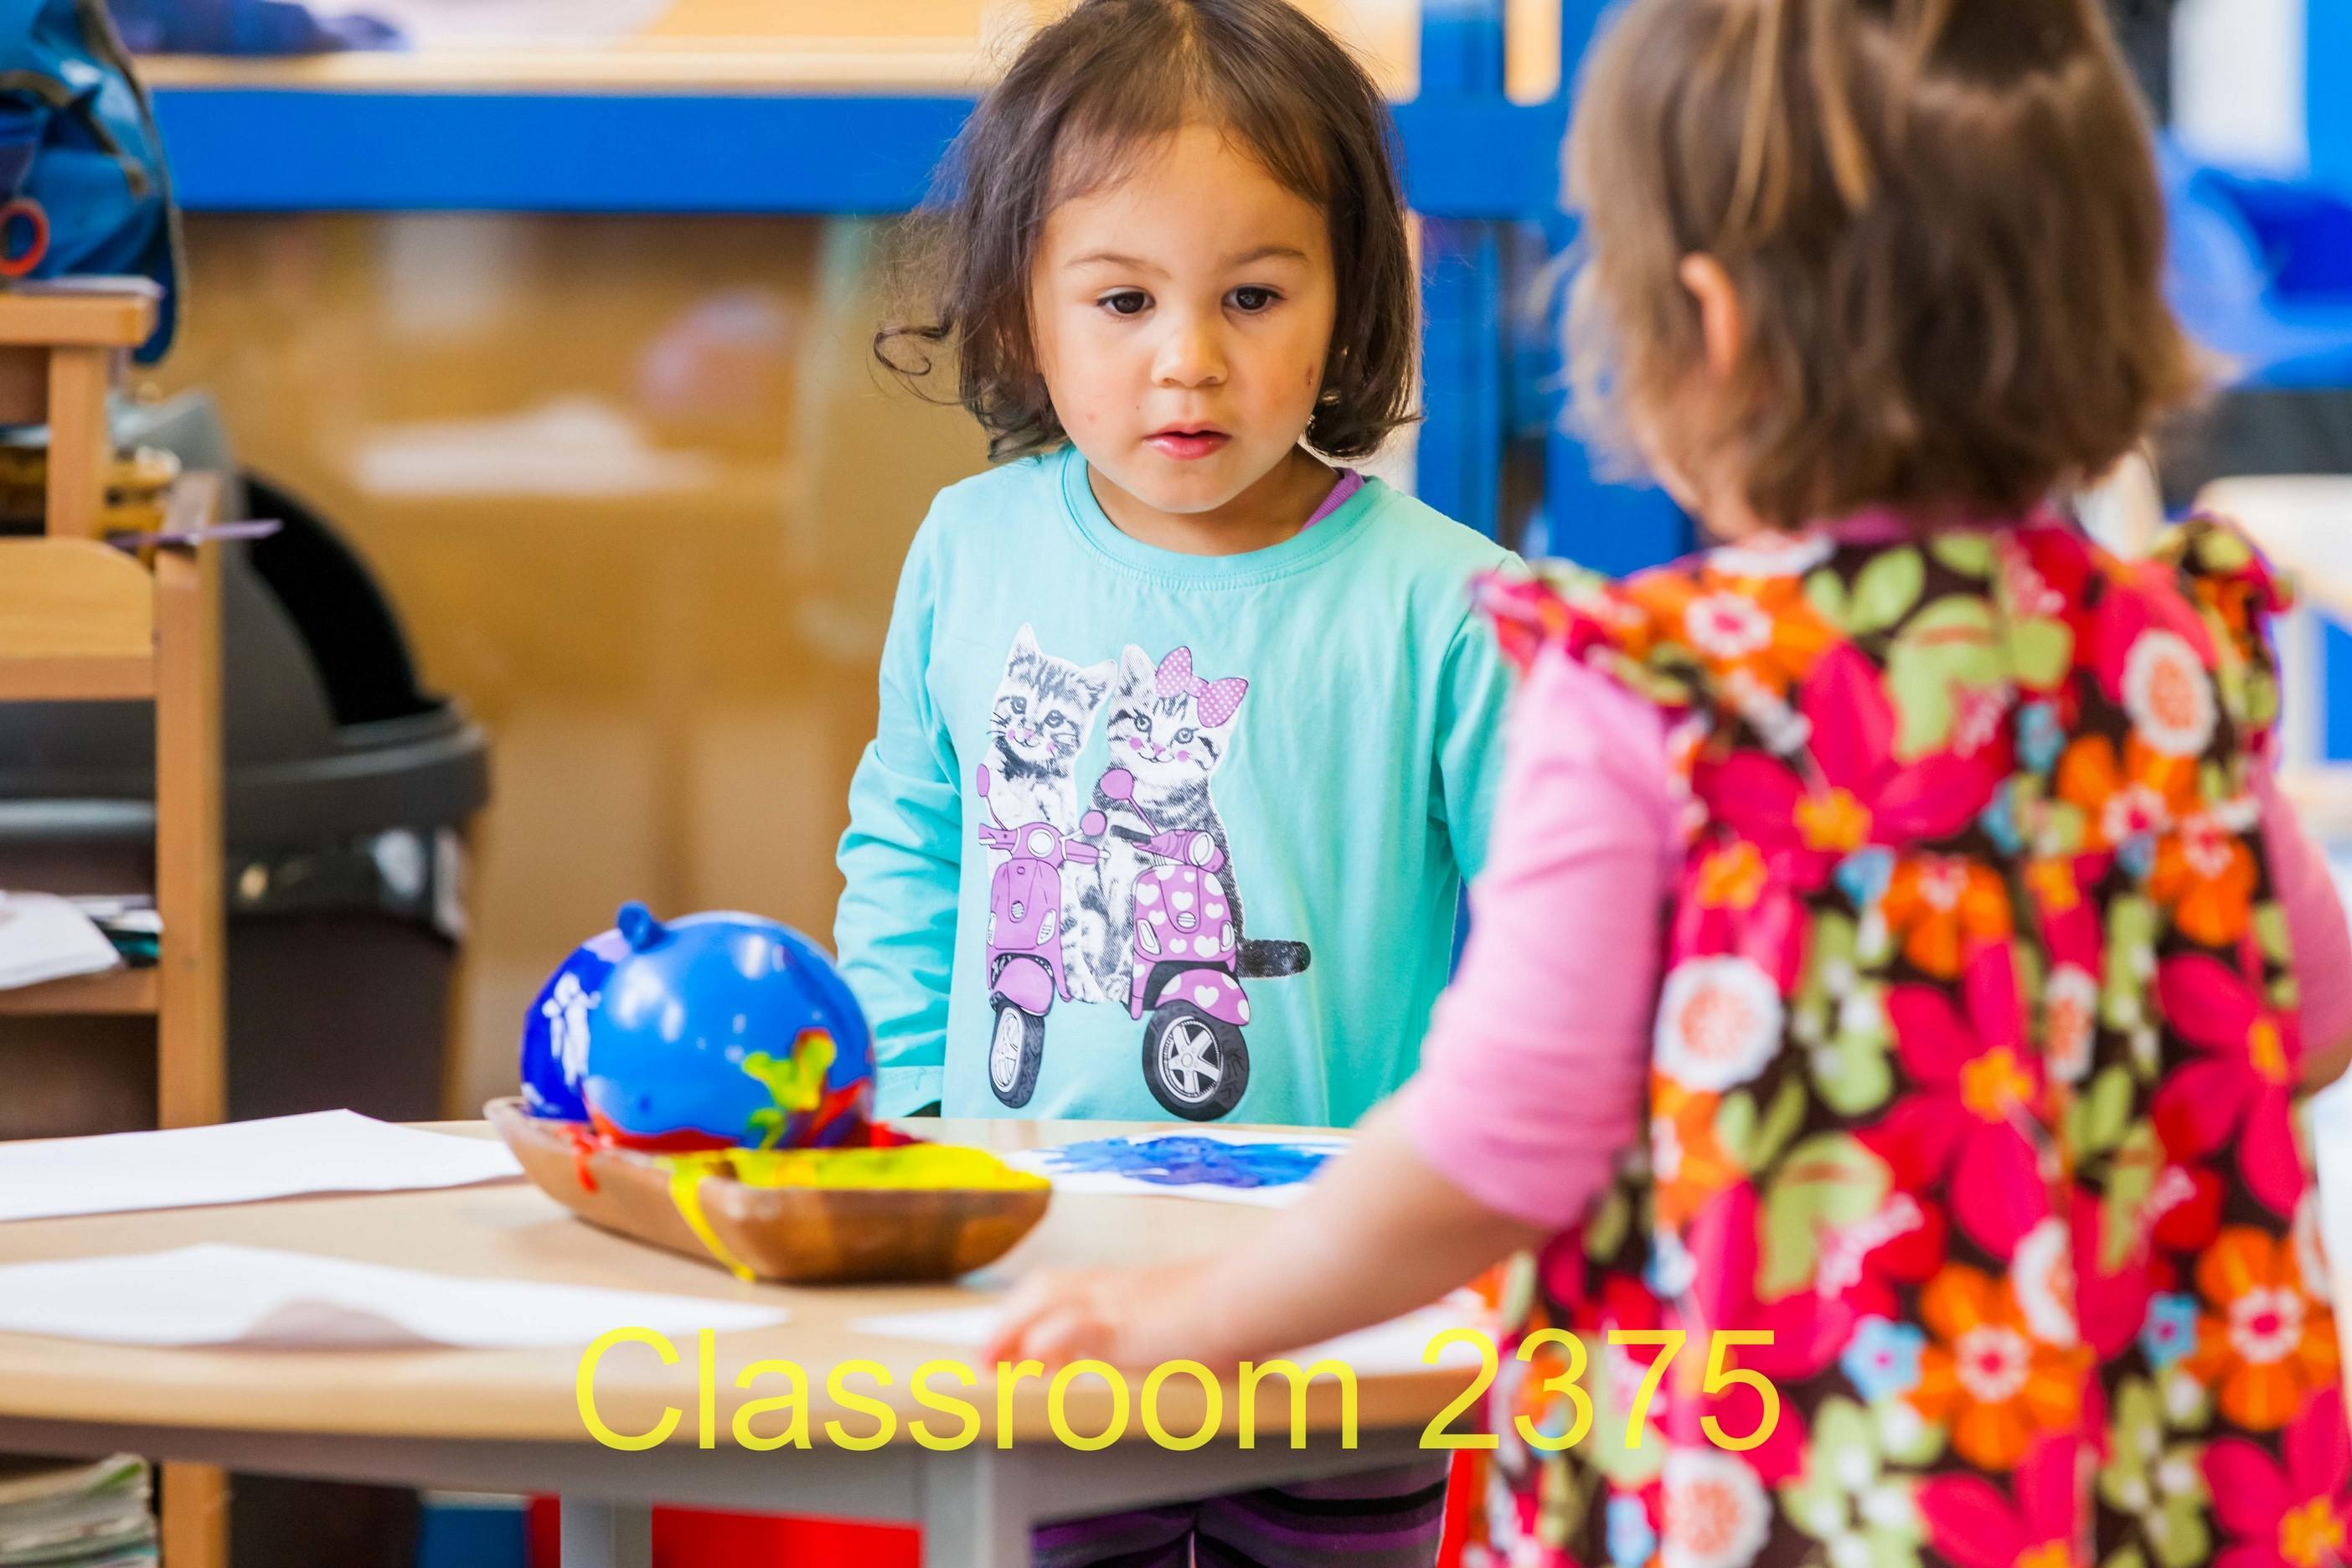 Classroom 2375